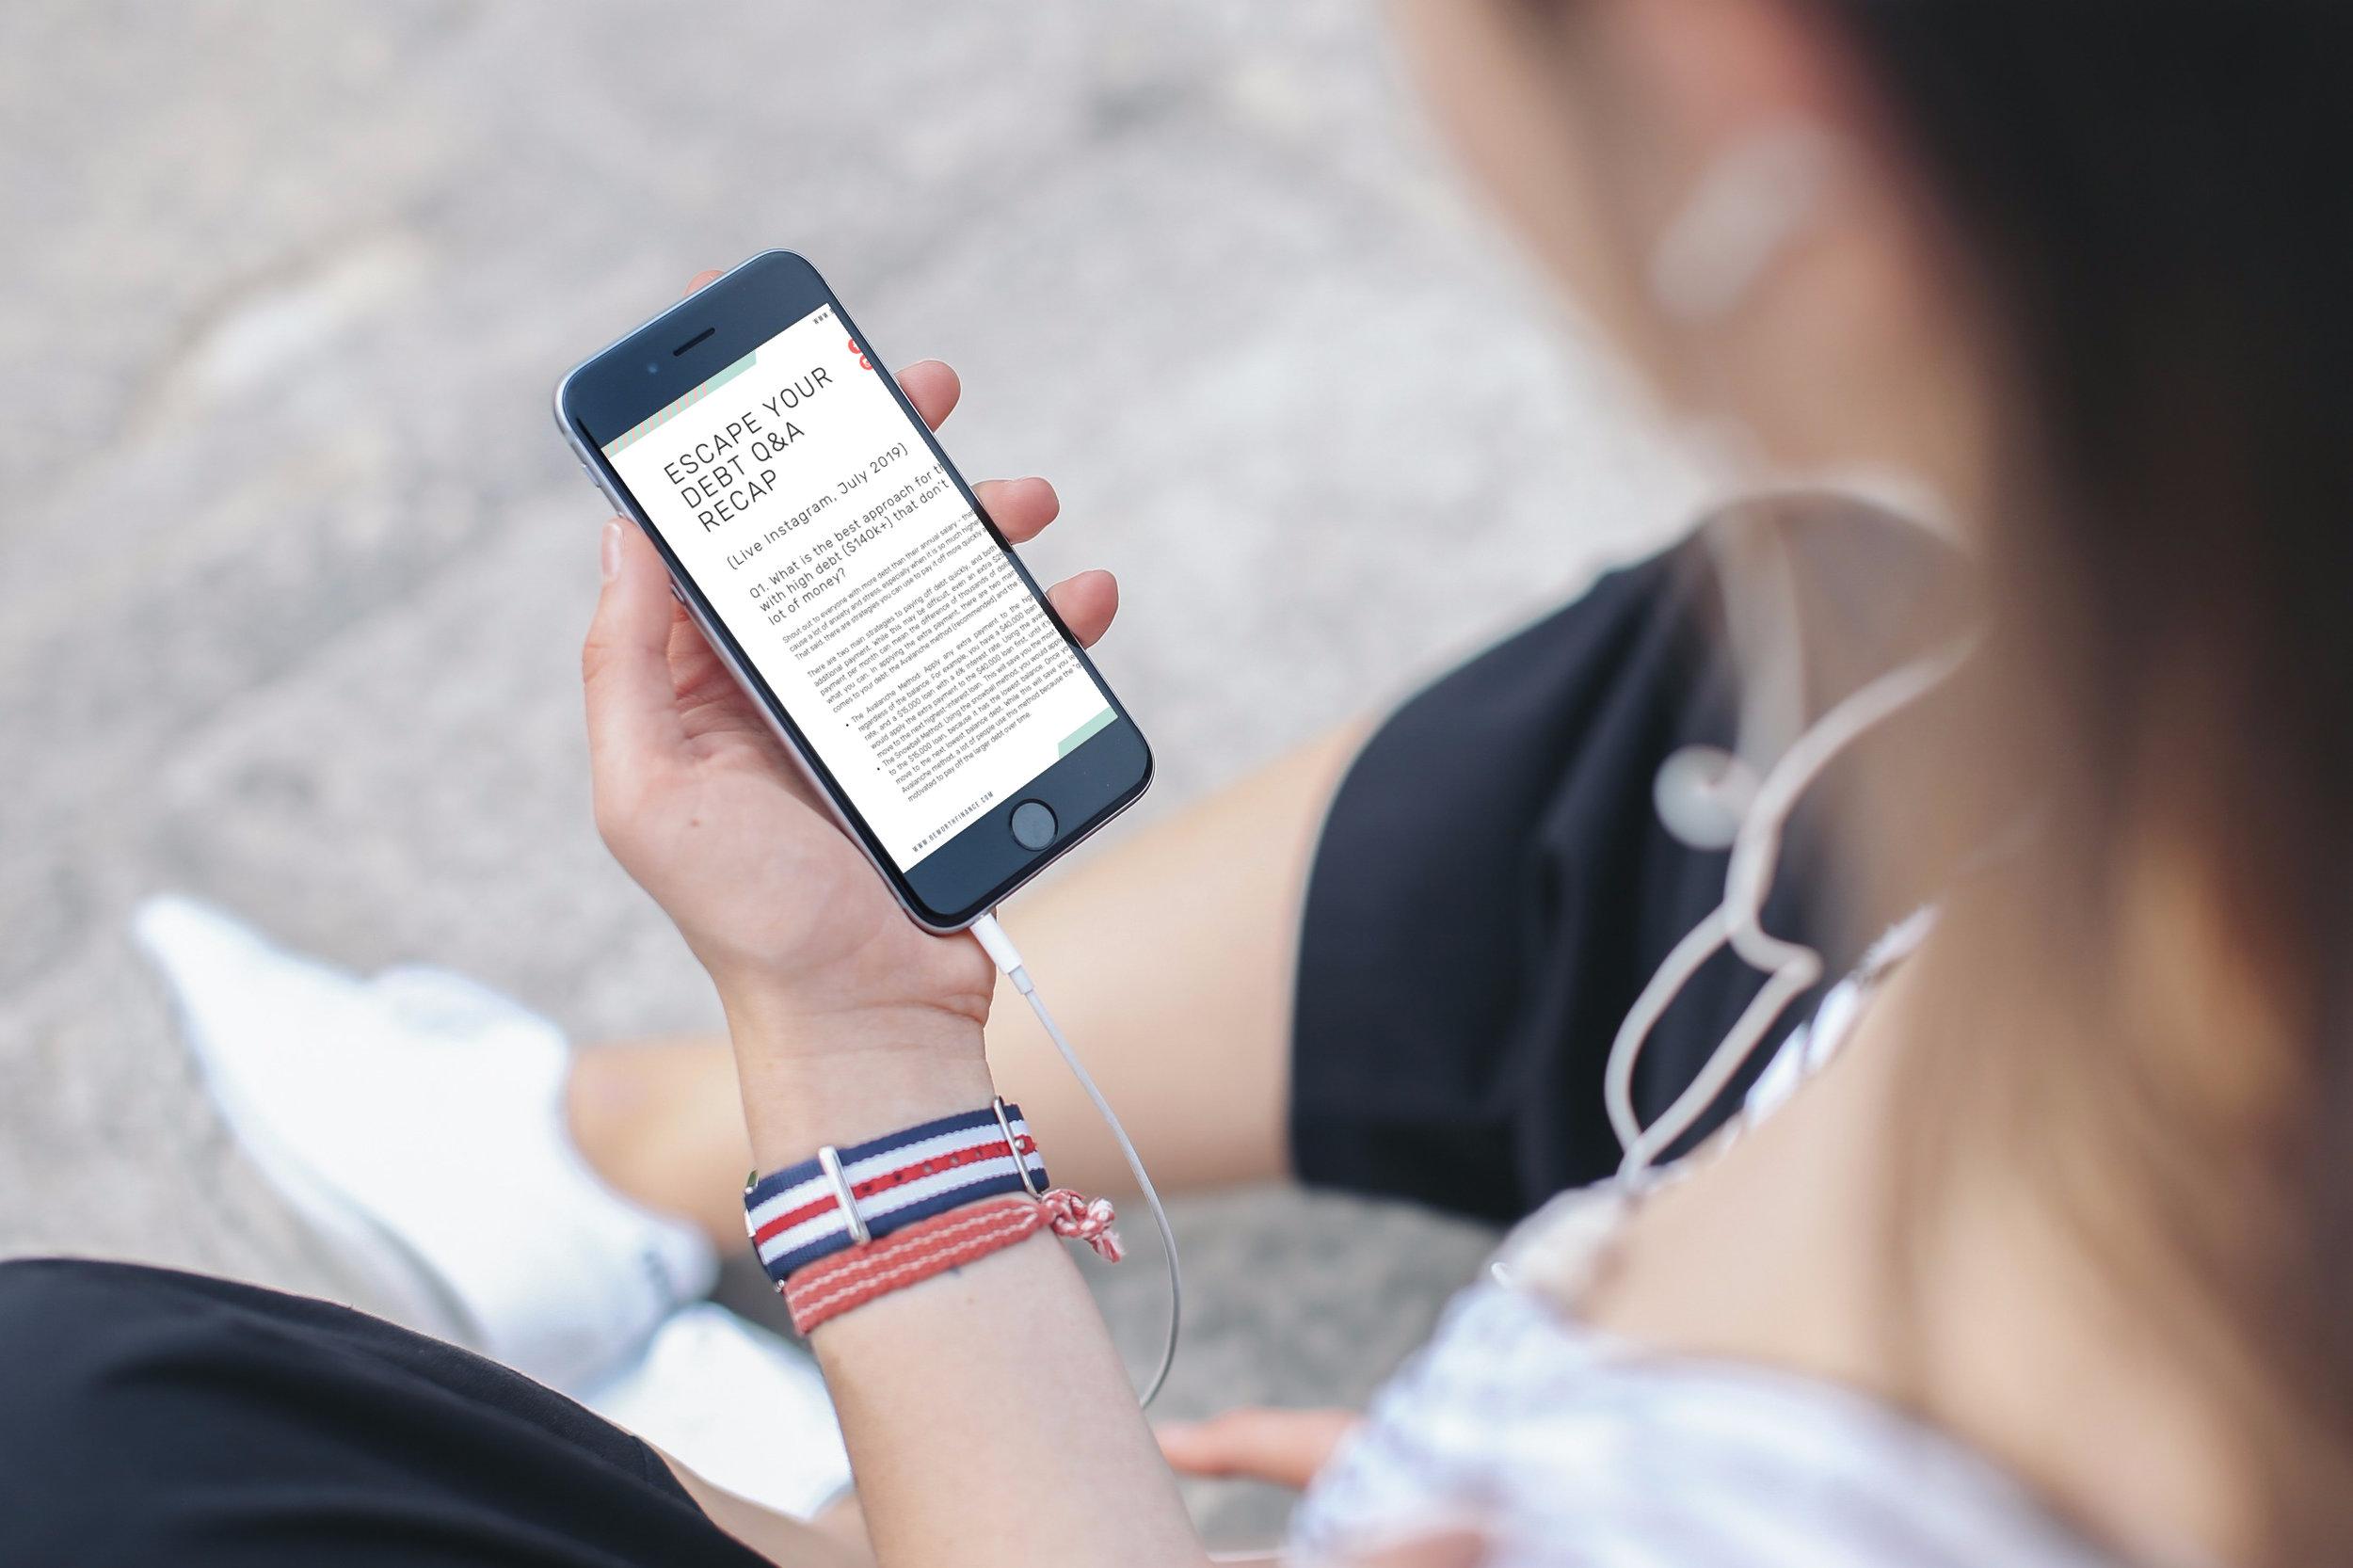 iphone-6-with-headphones.jpg